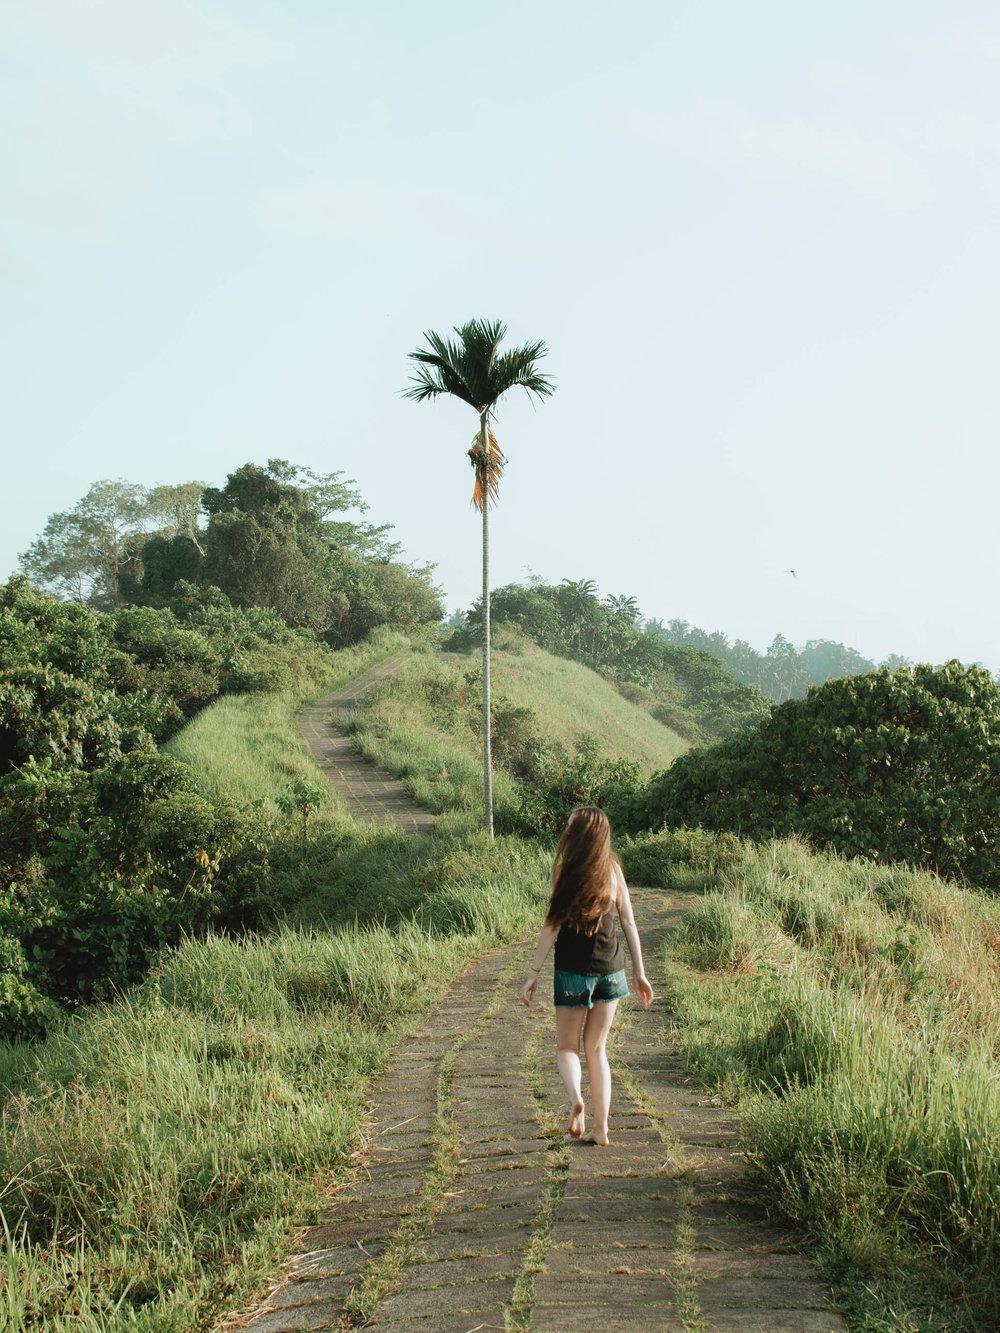 Walking the Campuhan Ridge Walk in Ubud, Bali